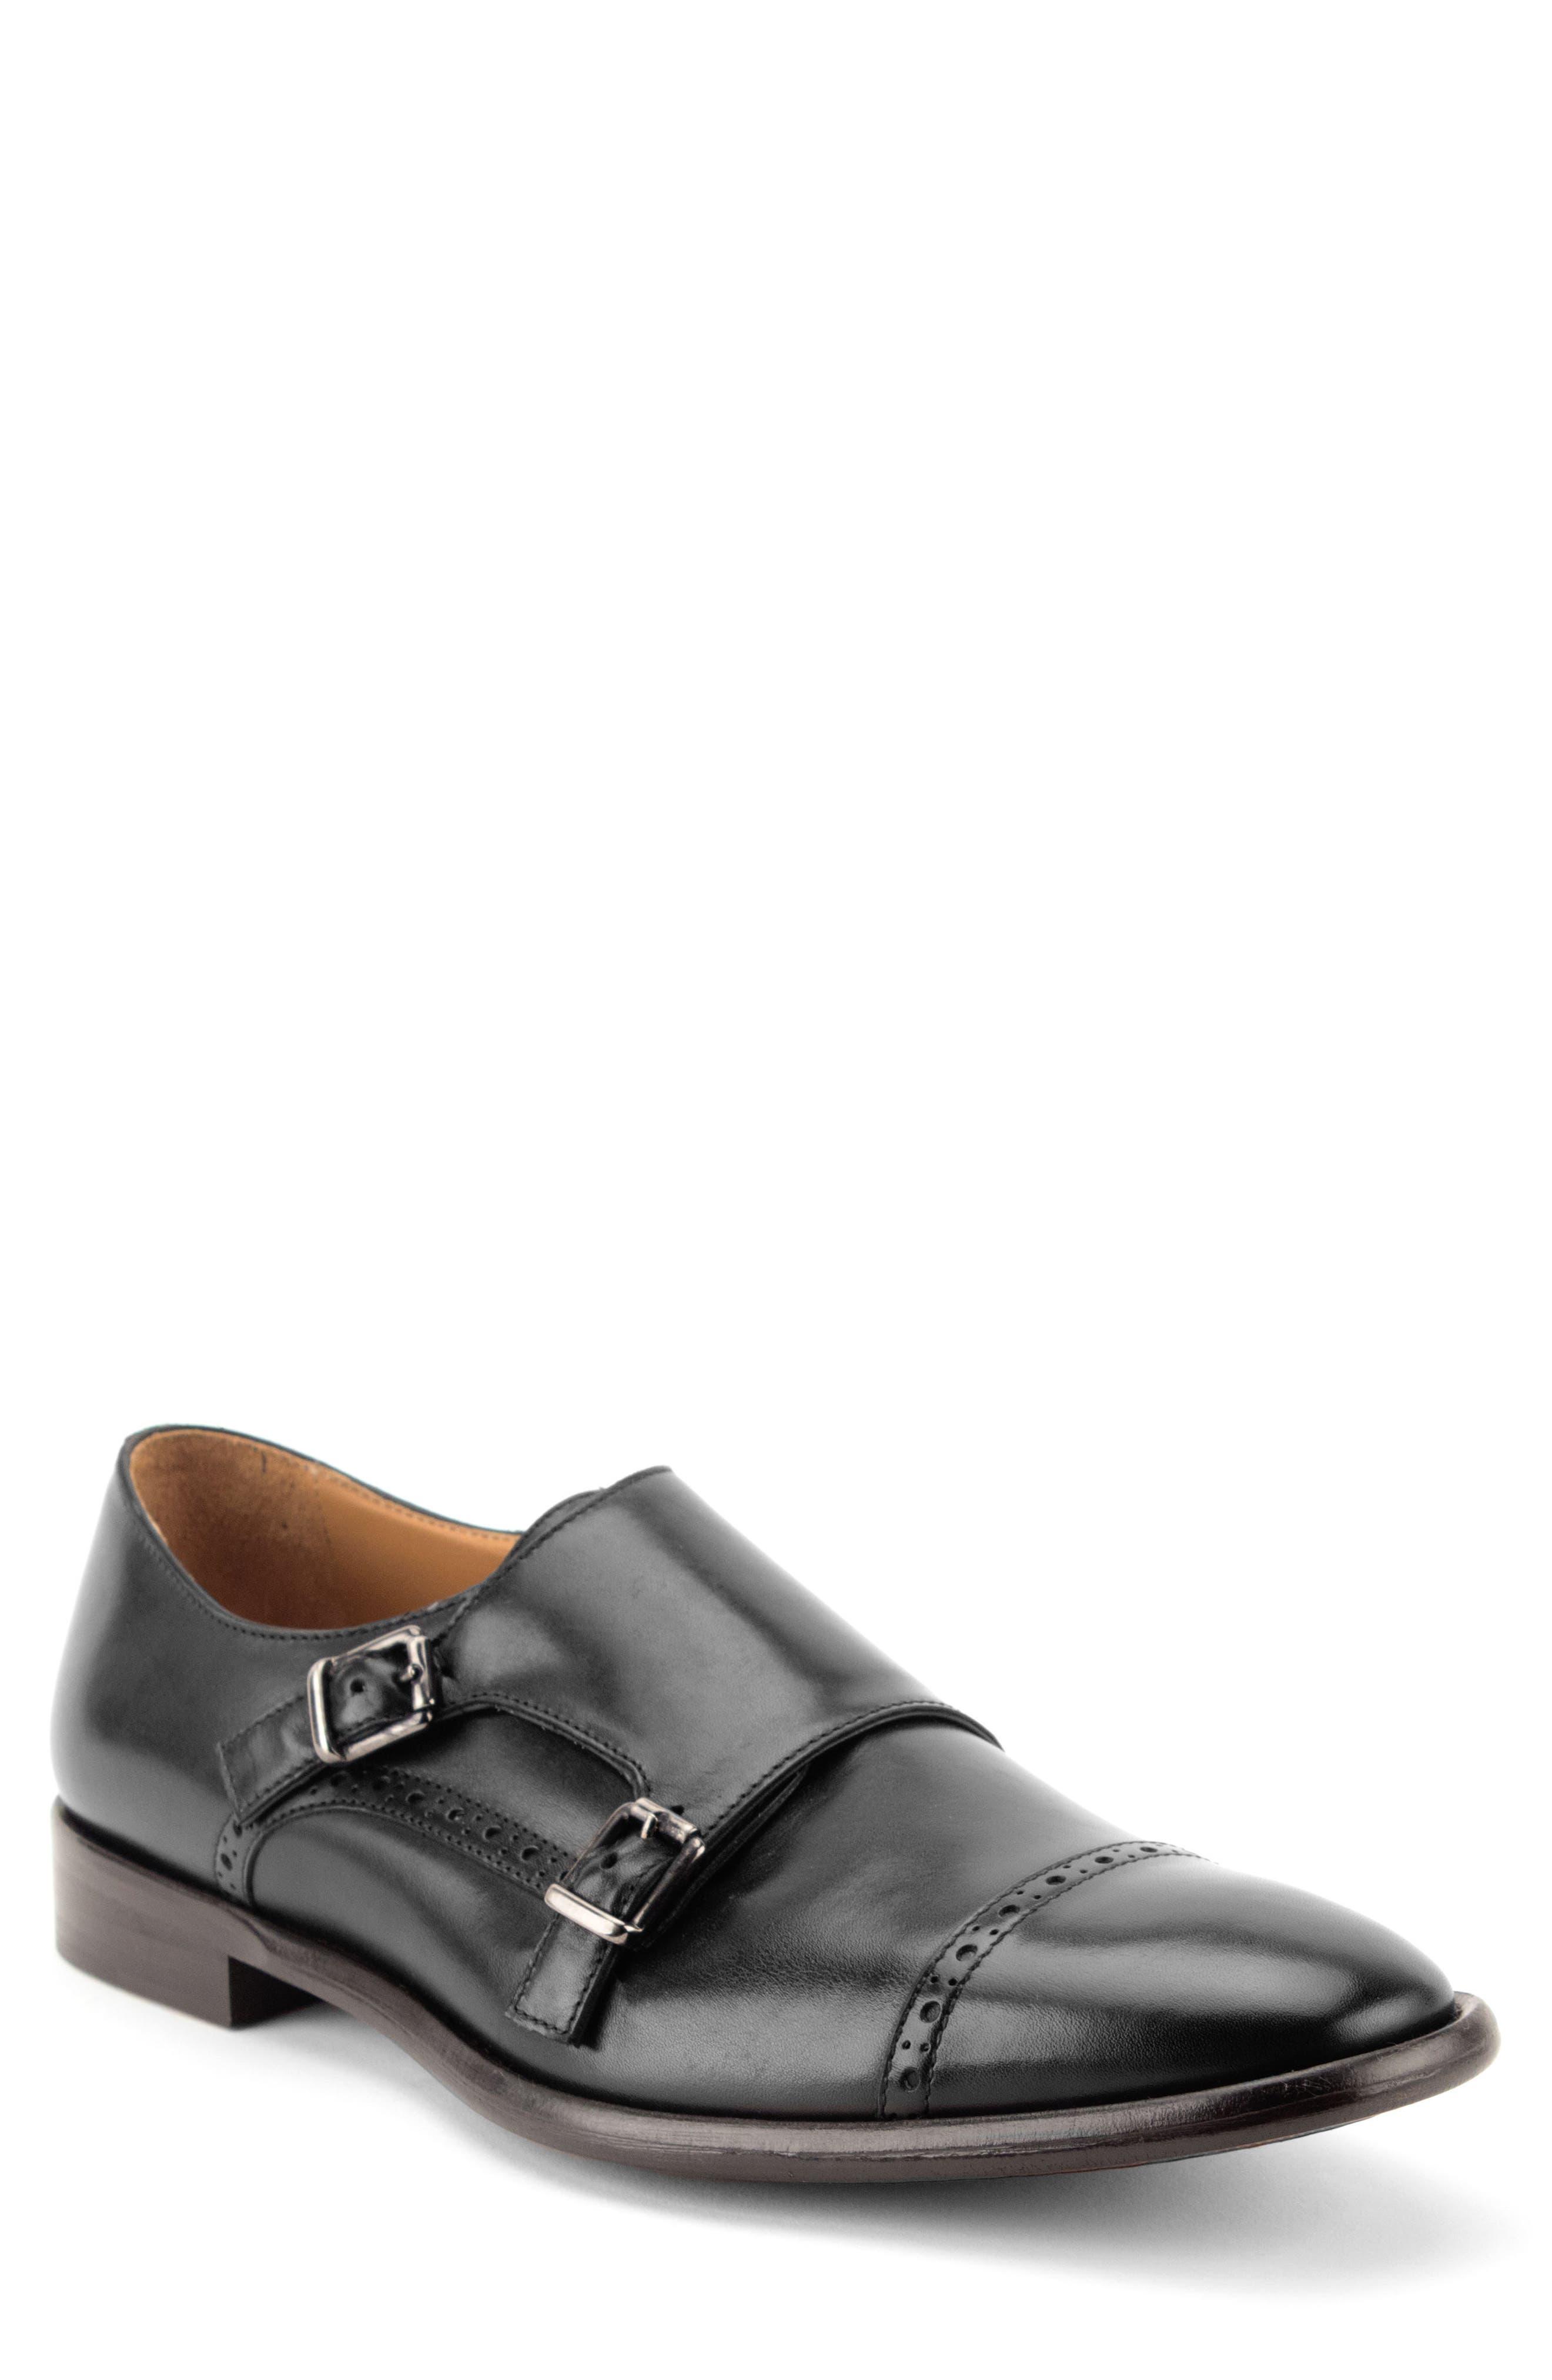 Corbett Cap Toe Double Strap Monk Shoe,                         Main,                         color, Black Leather